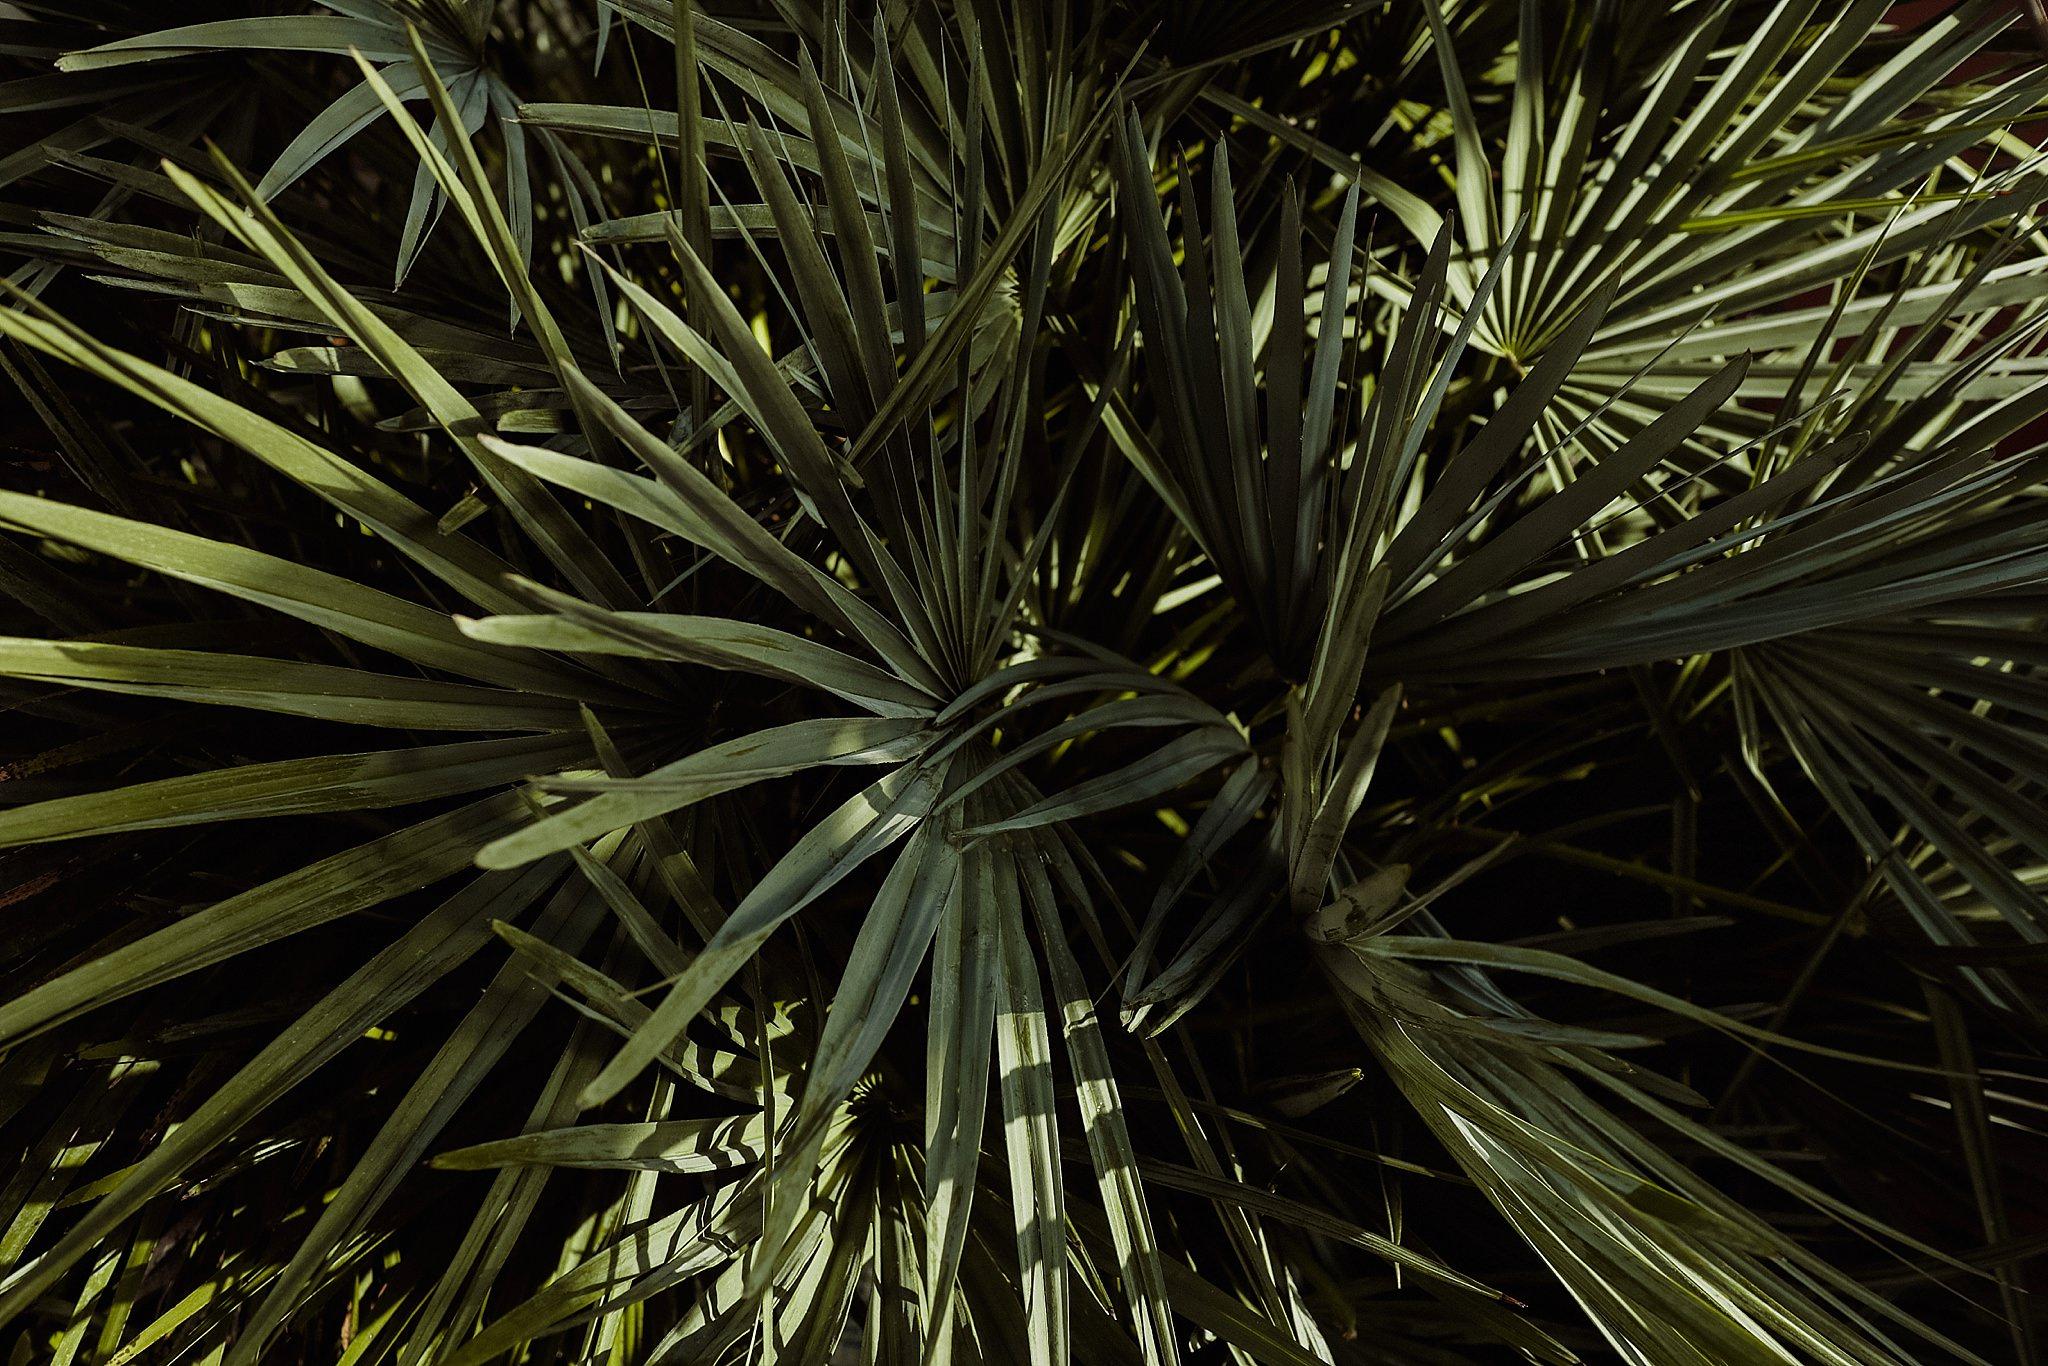 Nature_Photography_0003.jpg